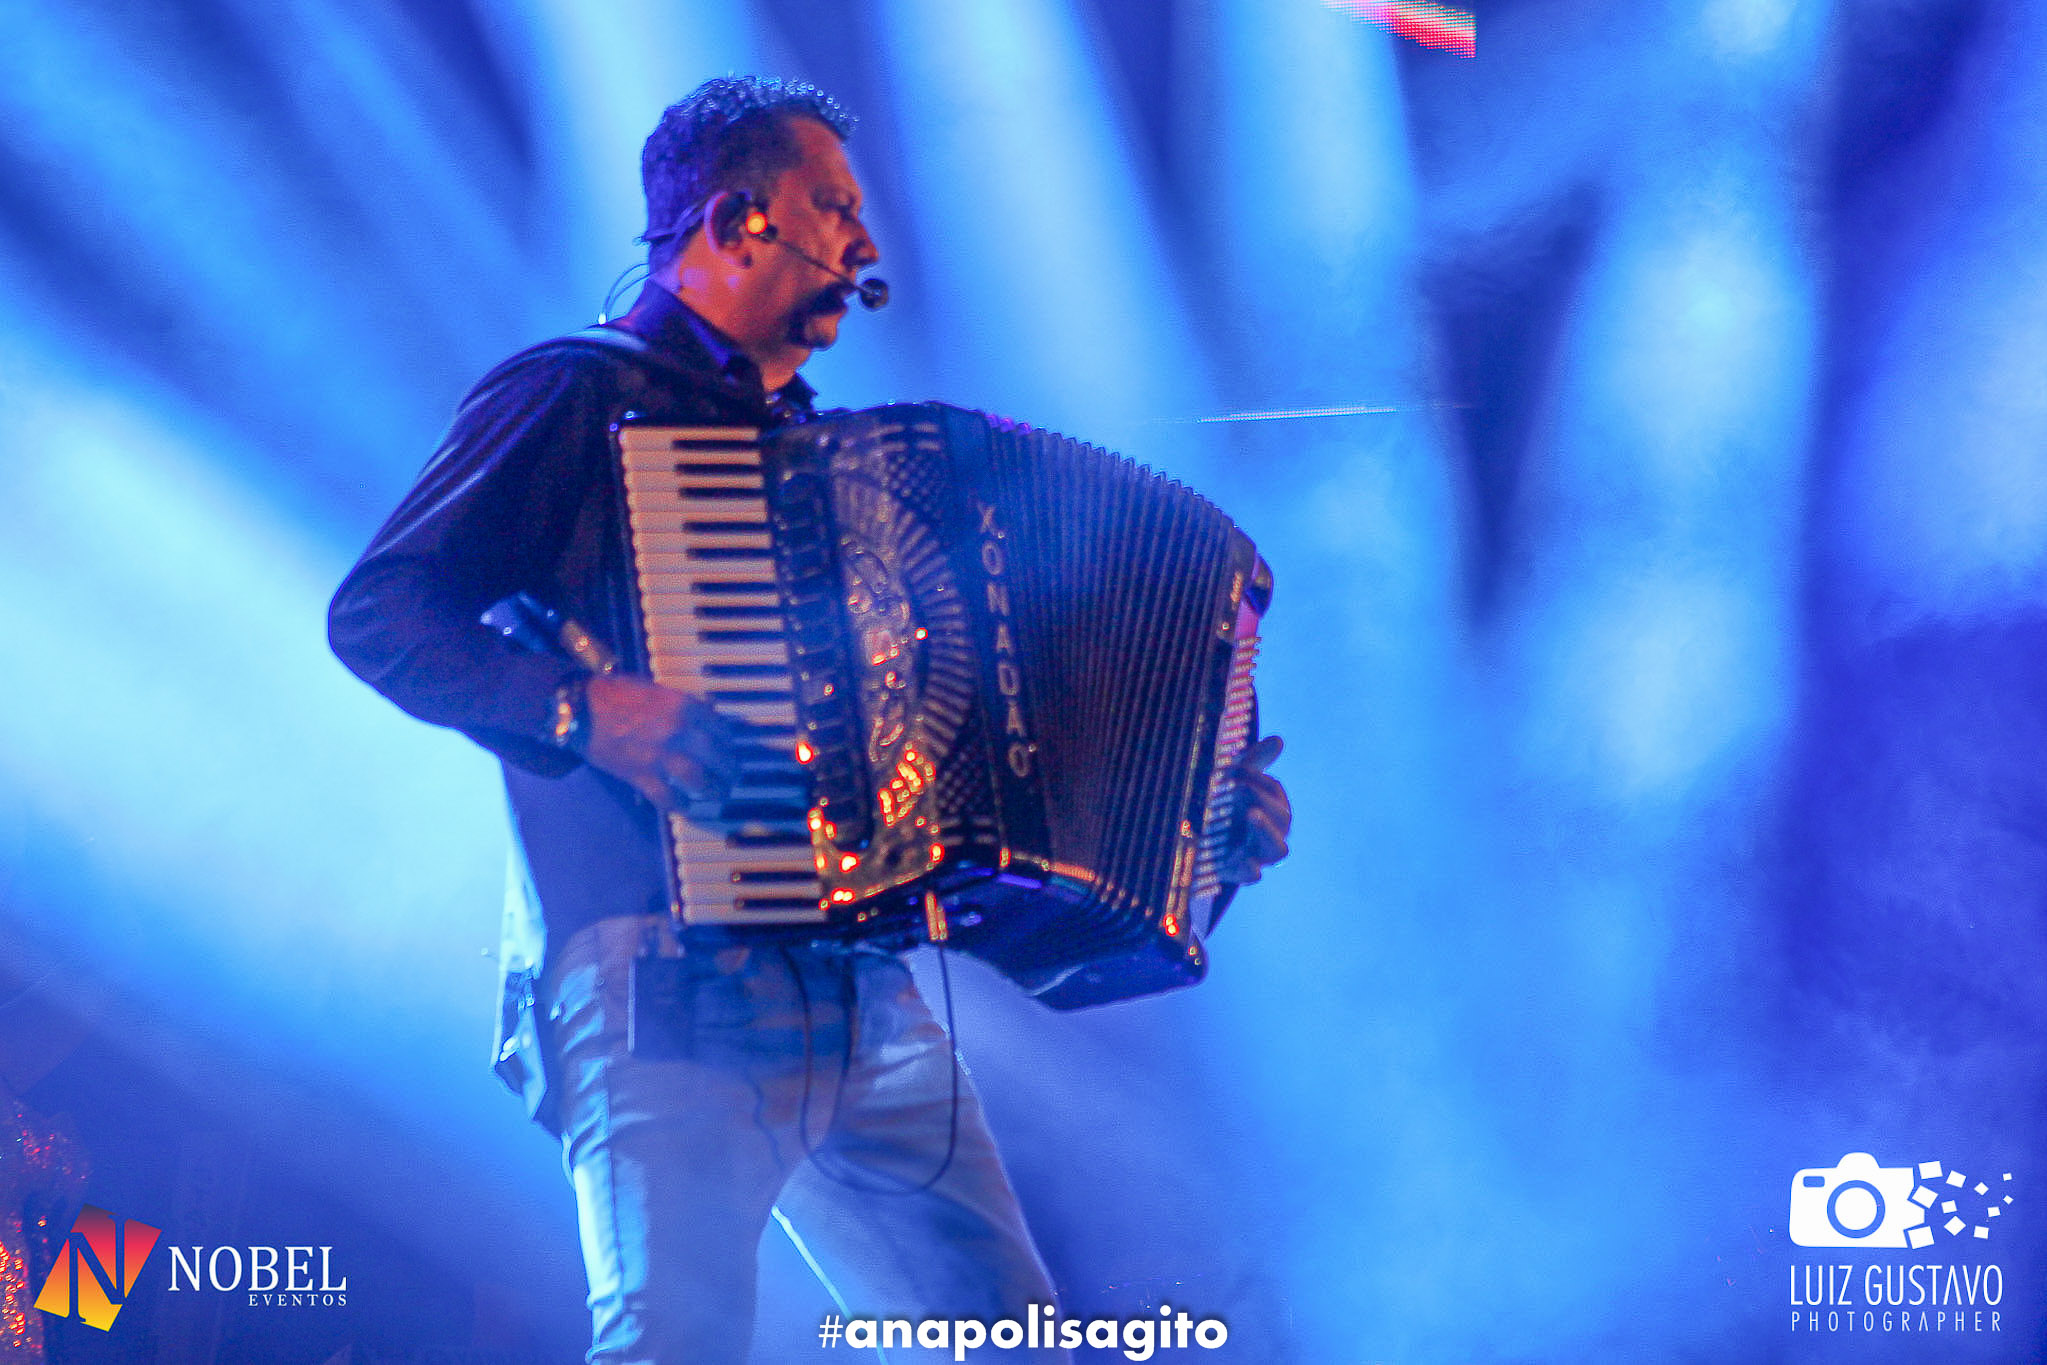 Luiz Gustavo Photographer-184